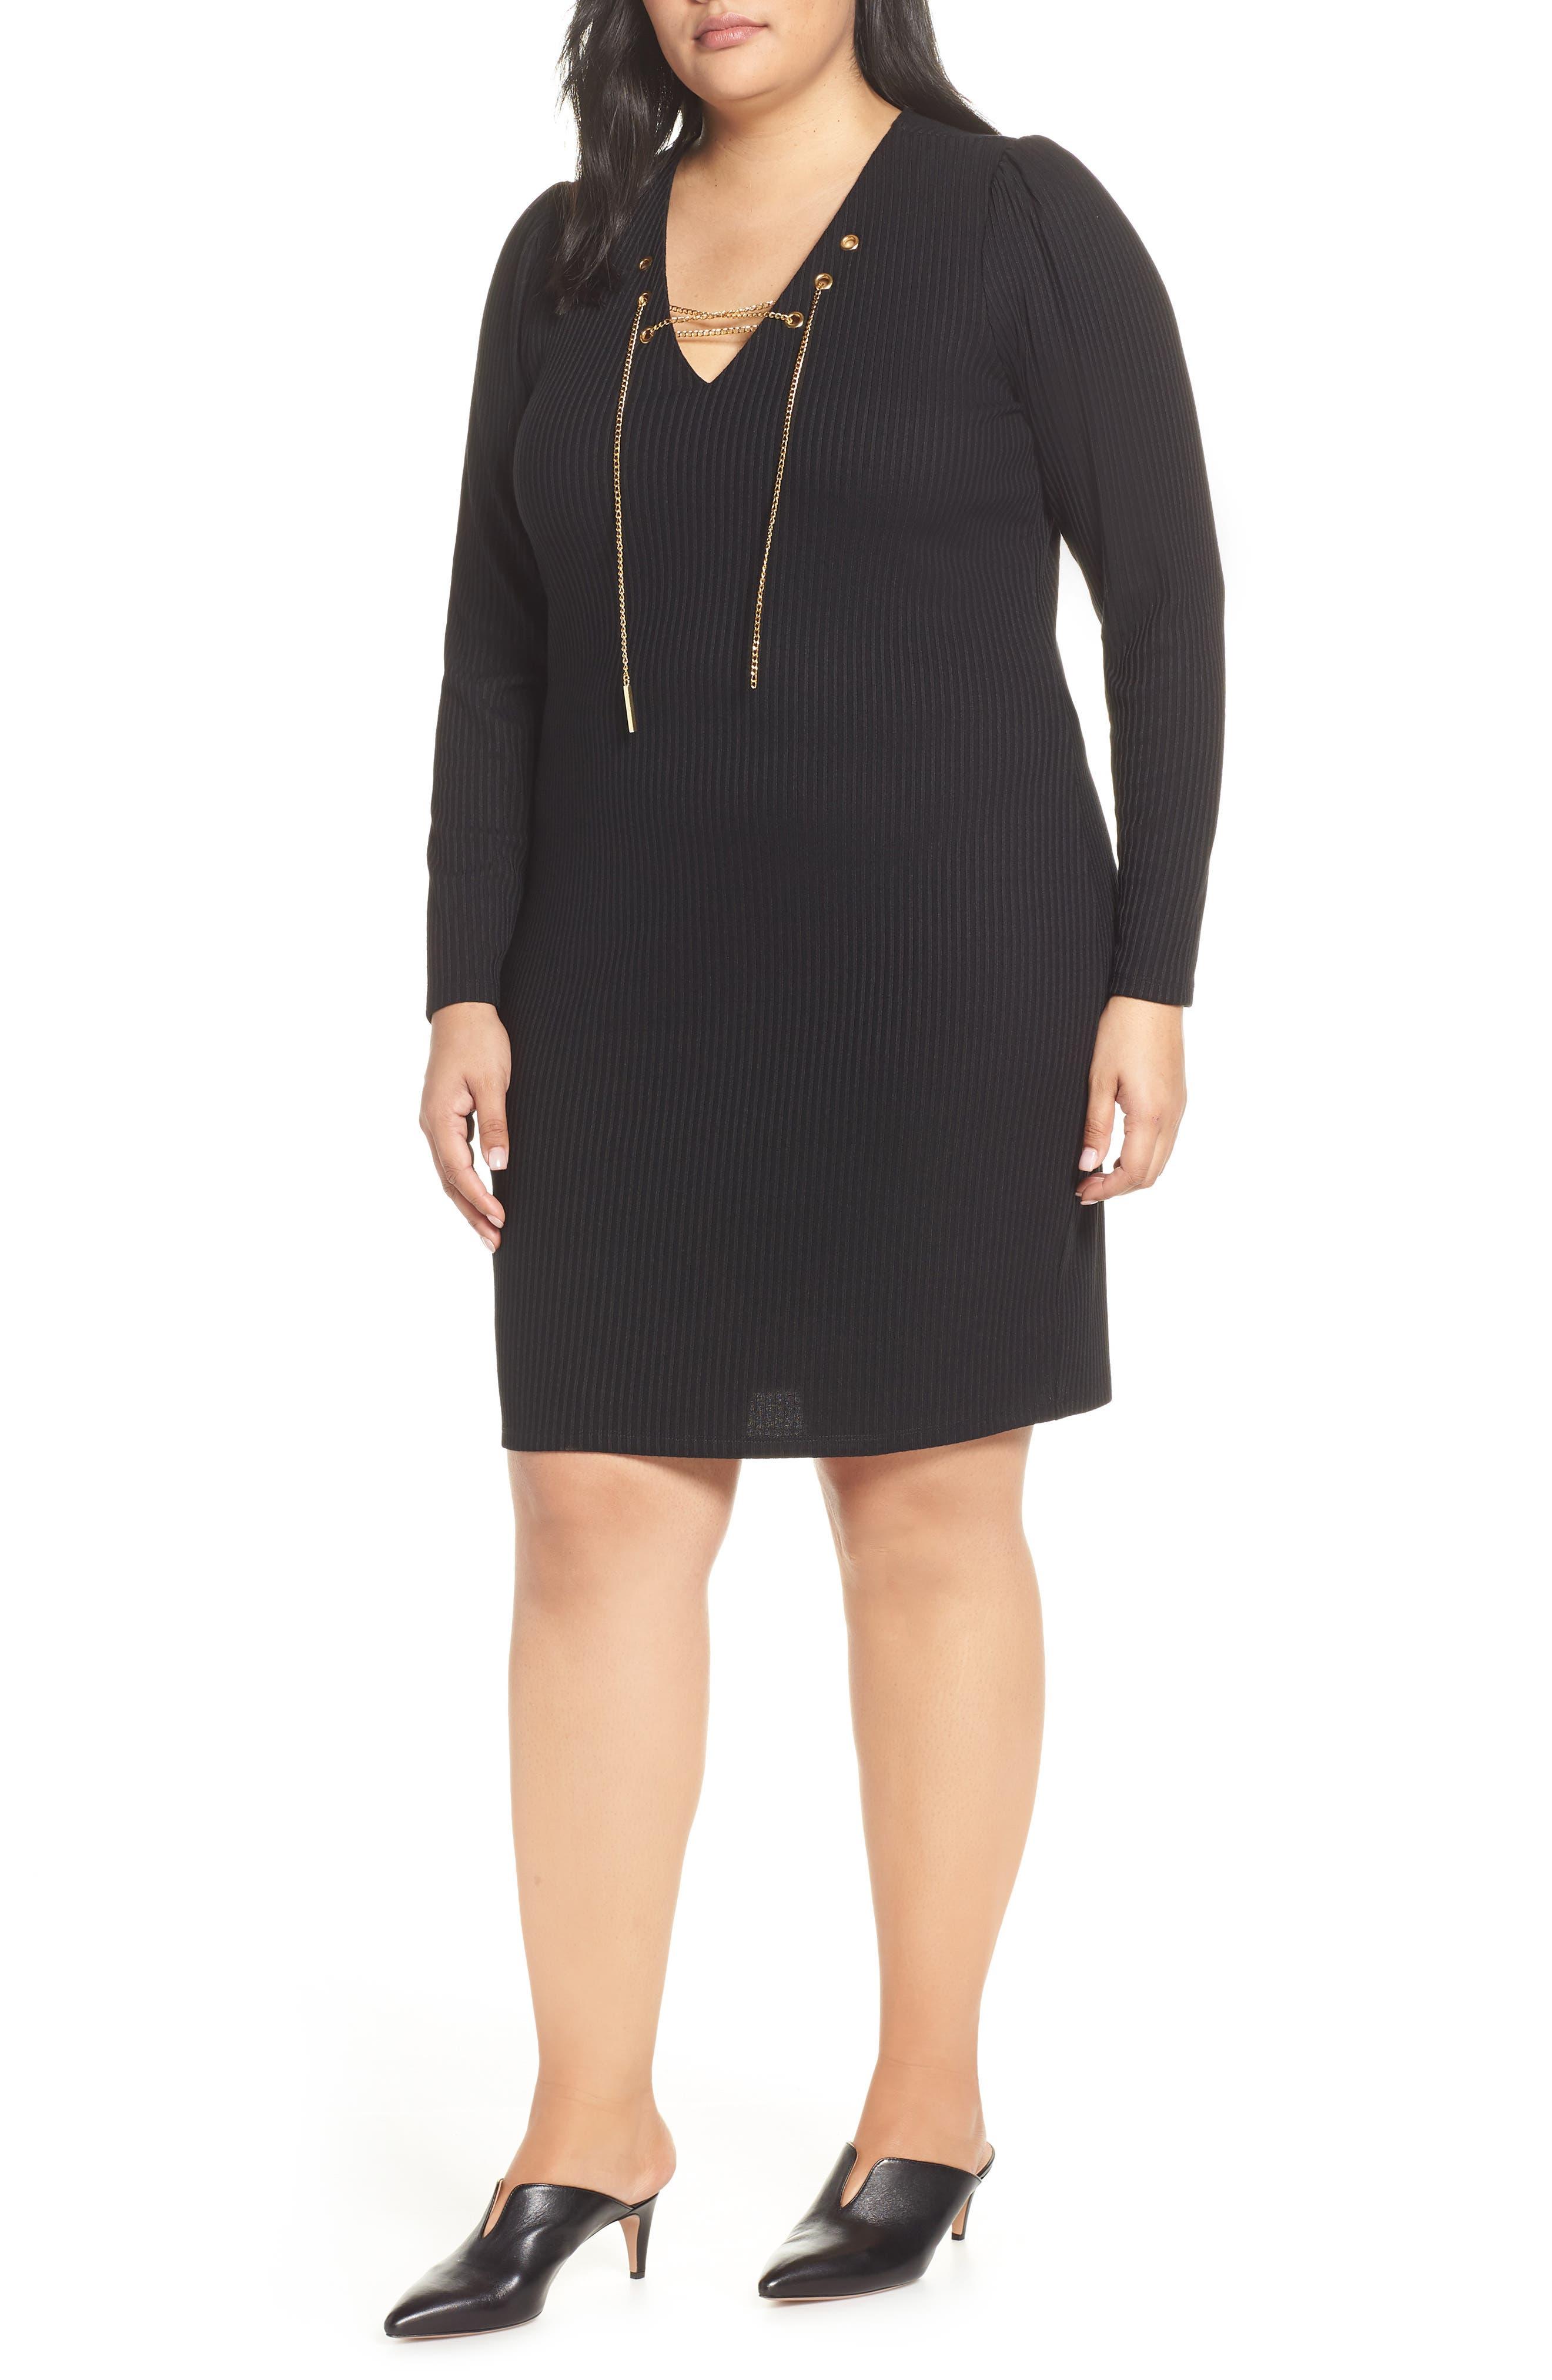 MICHAEL MICHAEL KORS Chain Lace-Up V-Neck Sweater Dress, Main, color, 001